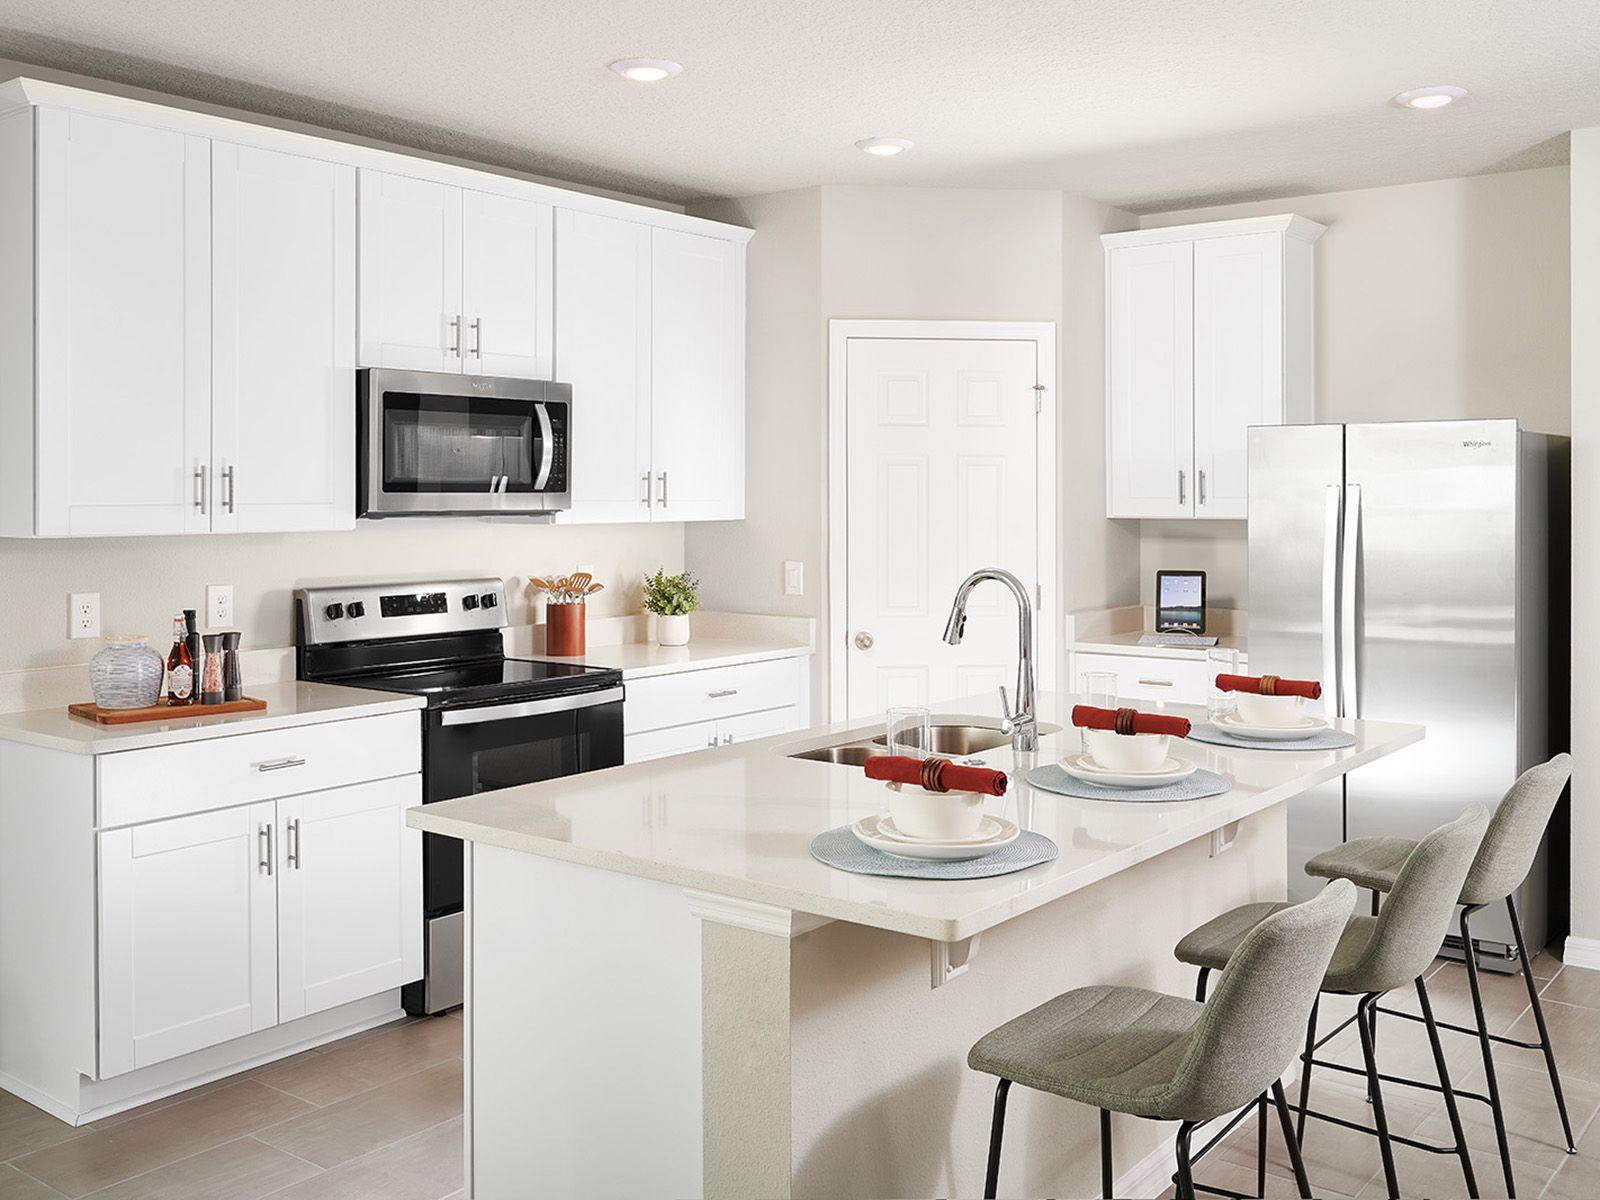 Kitchen featured in the Daphne By Meritage Homes in Daytona Beach, FL